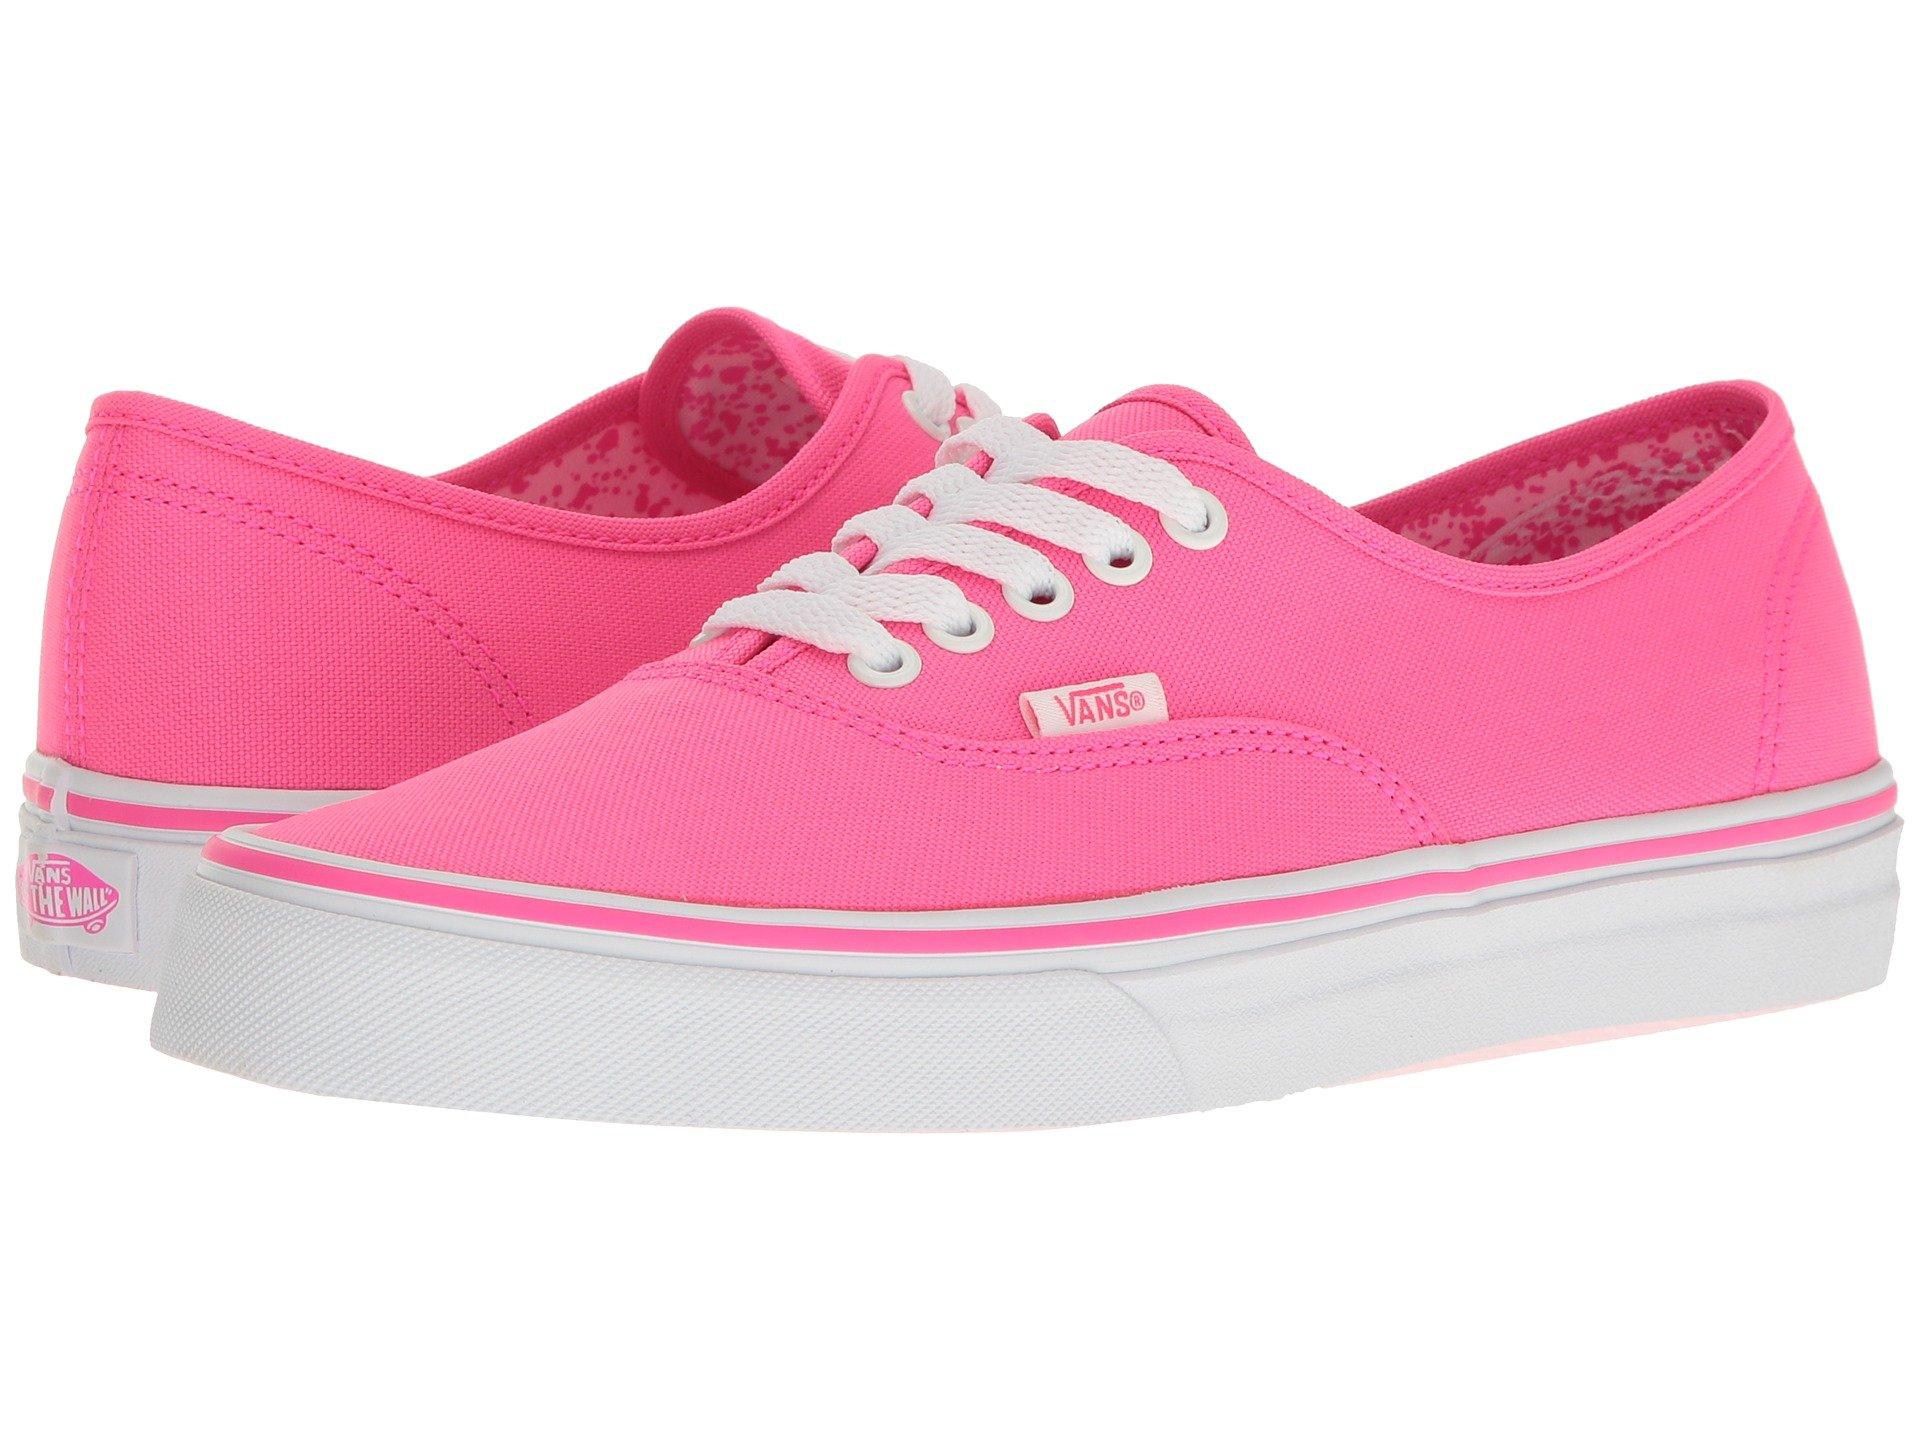 Vans Authentic™ In (Neon Splatter) Neon Pink True White  e5da9b393